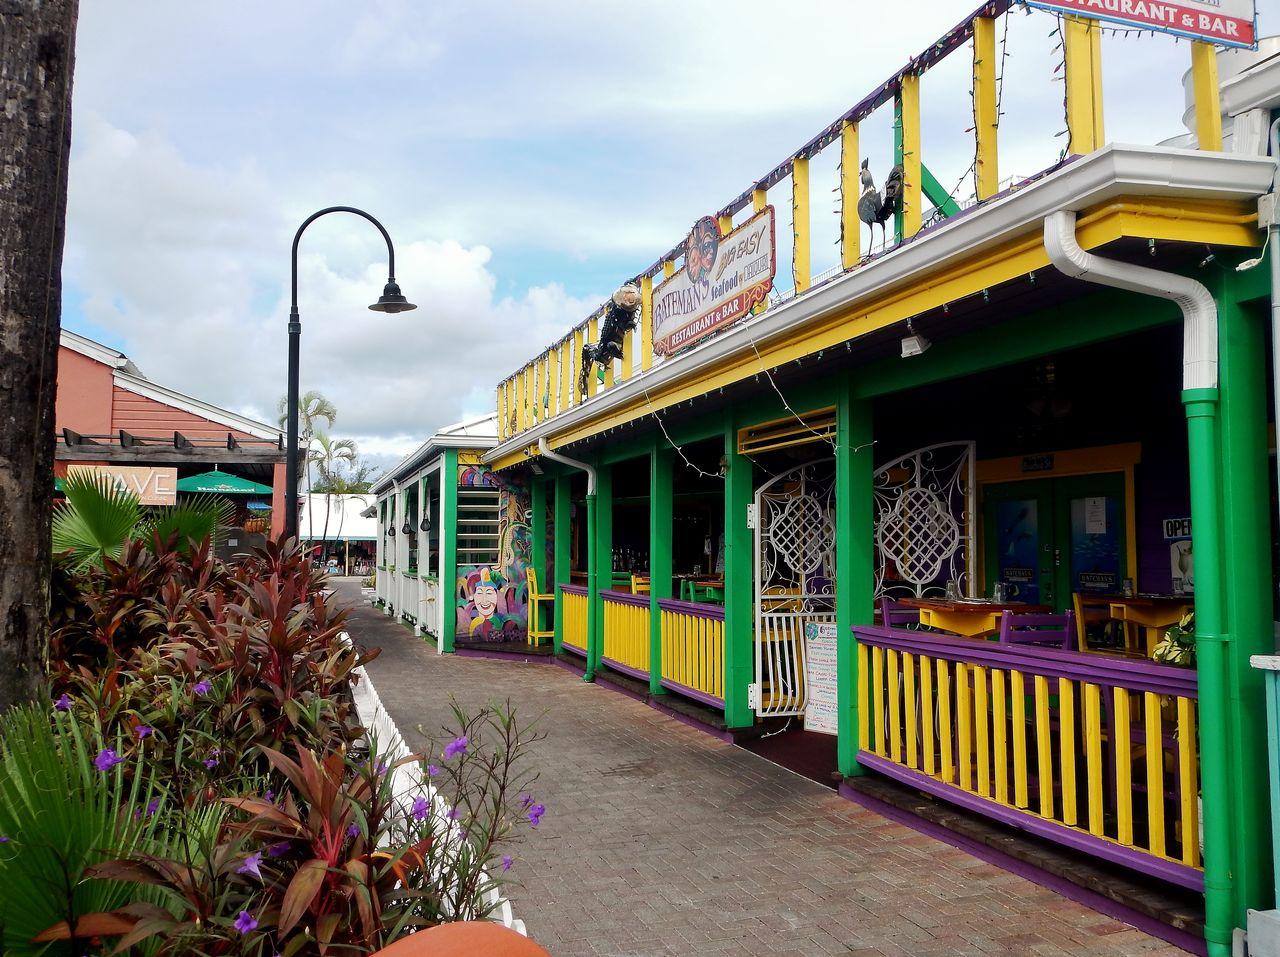 Bahamas Grand Bahama Port Lucaya Marketplace